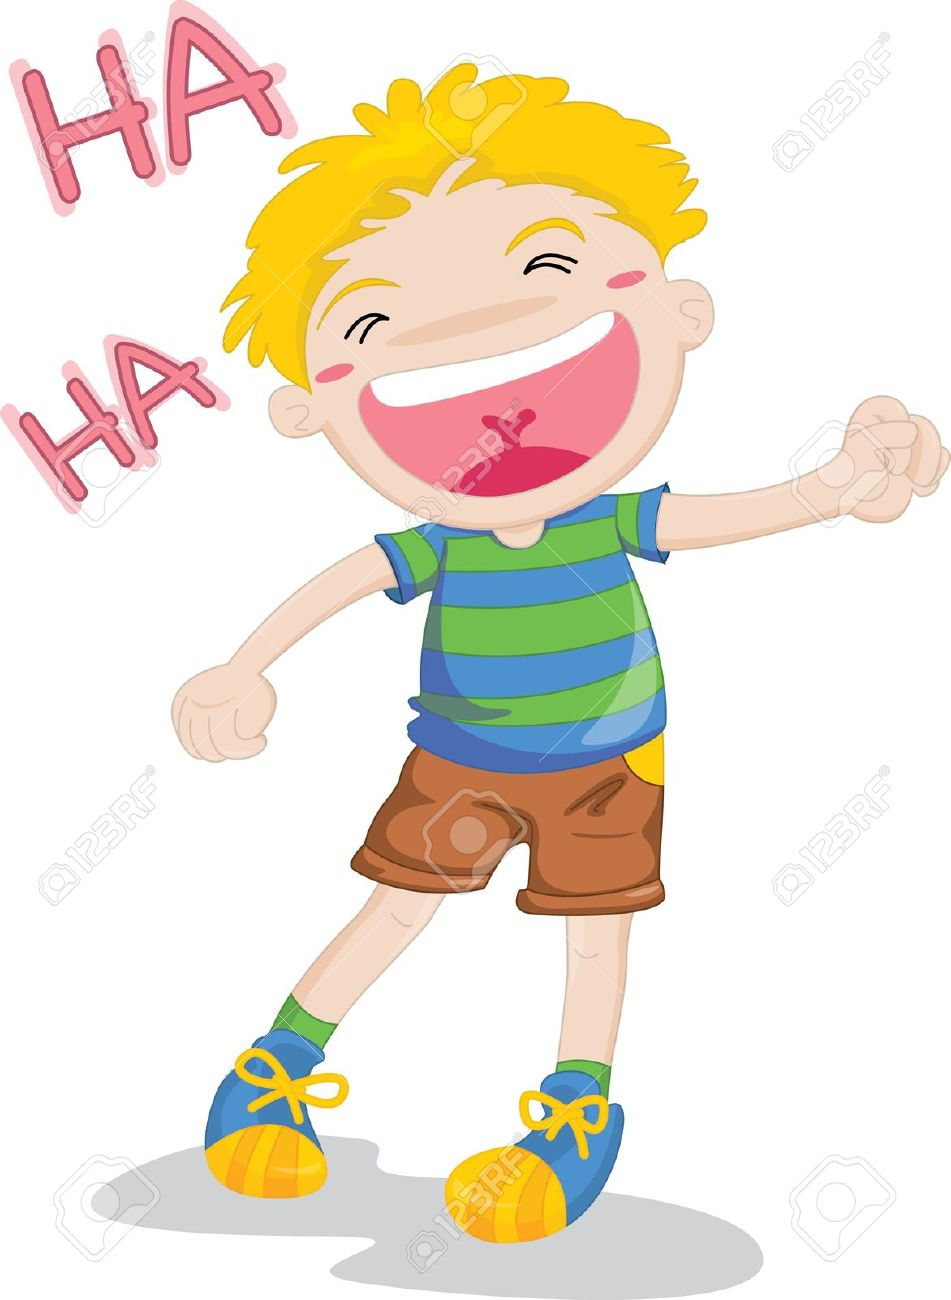 Clipart kids laughing clip art transparent download Clipart kids laughing - ClipartFest clip art transparent download